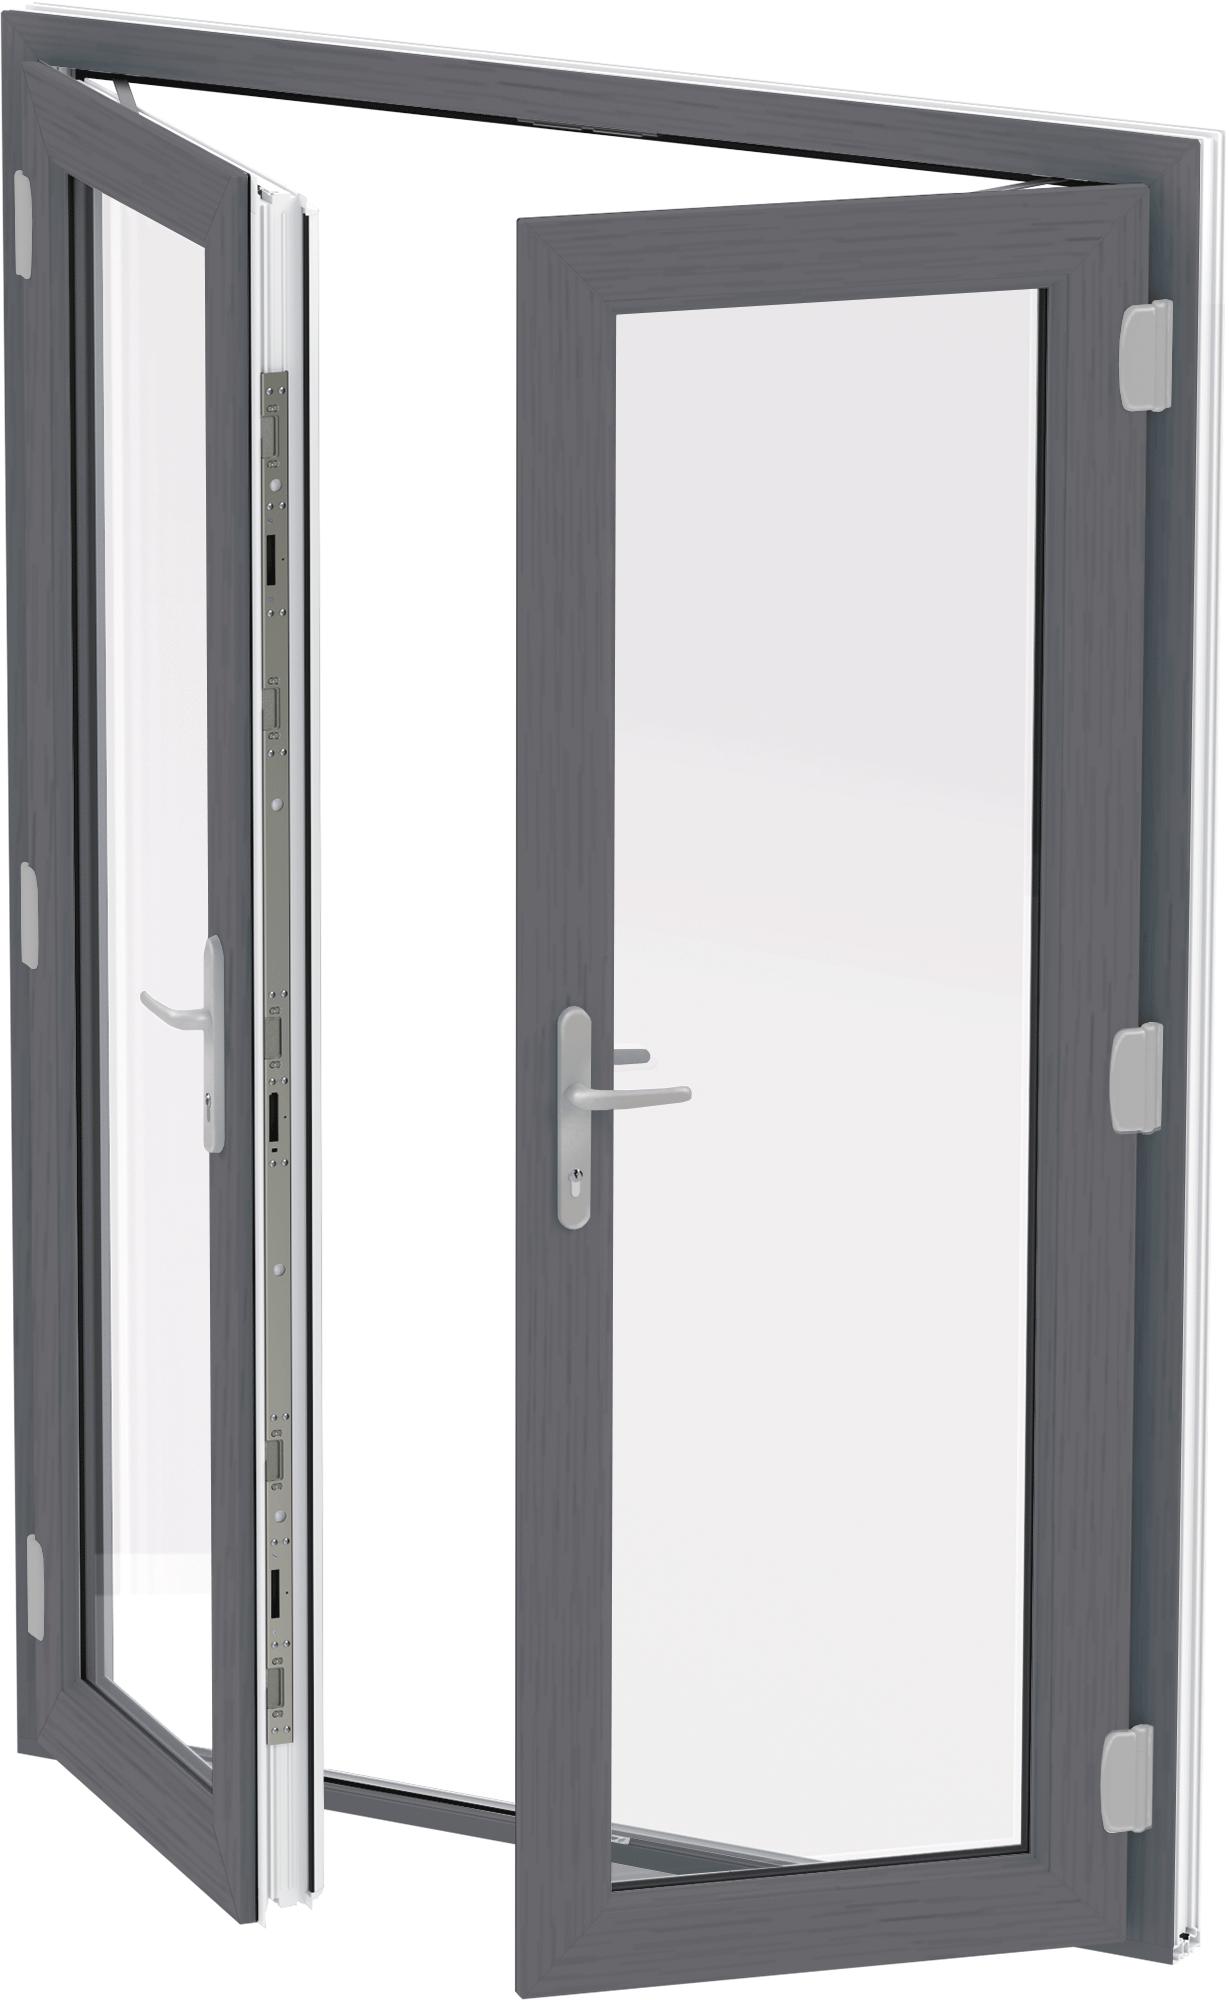 Southgate Windows Upvc French Doors Bridgwater Bristol